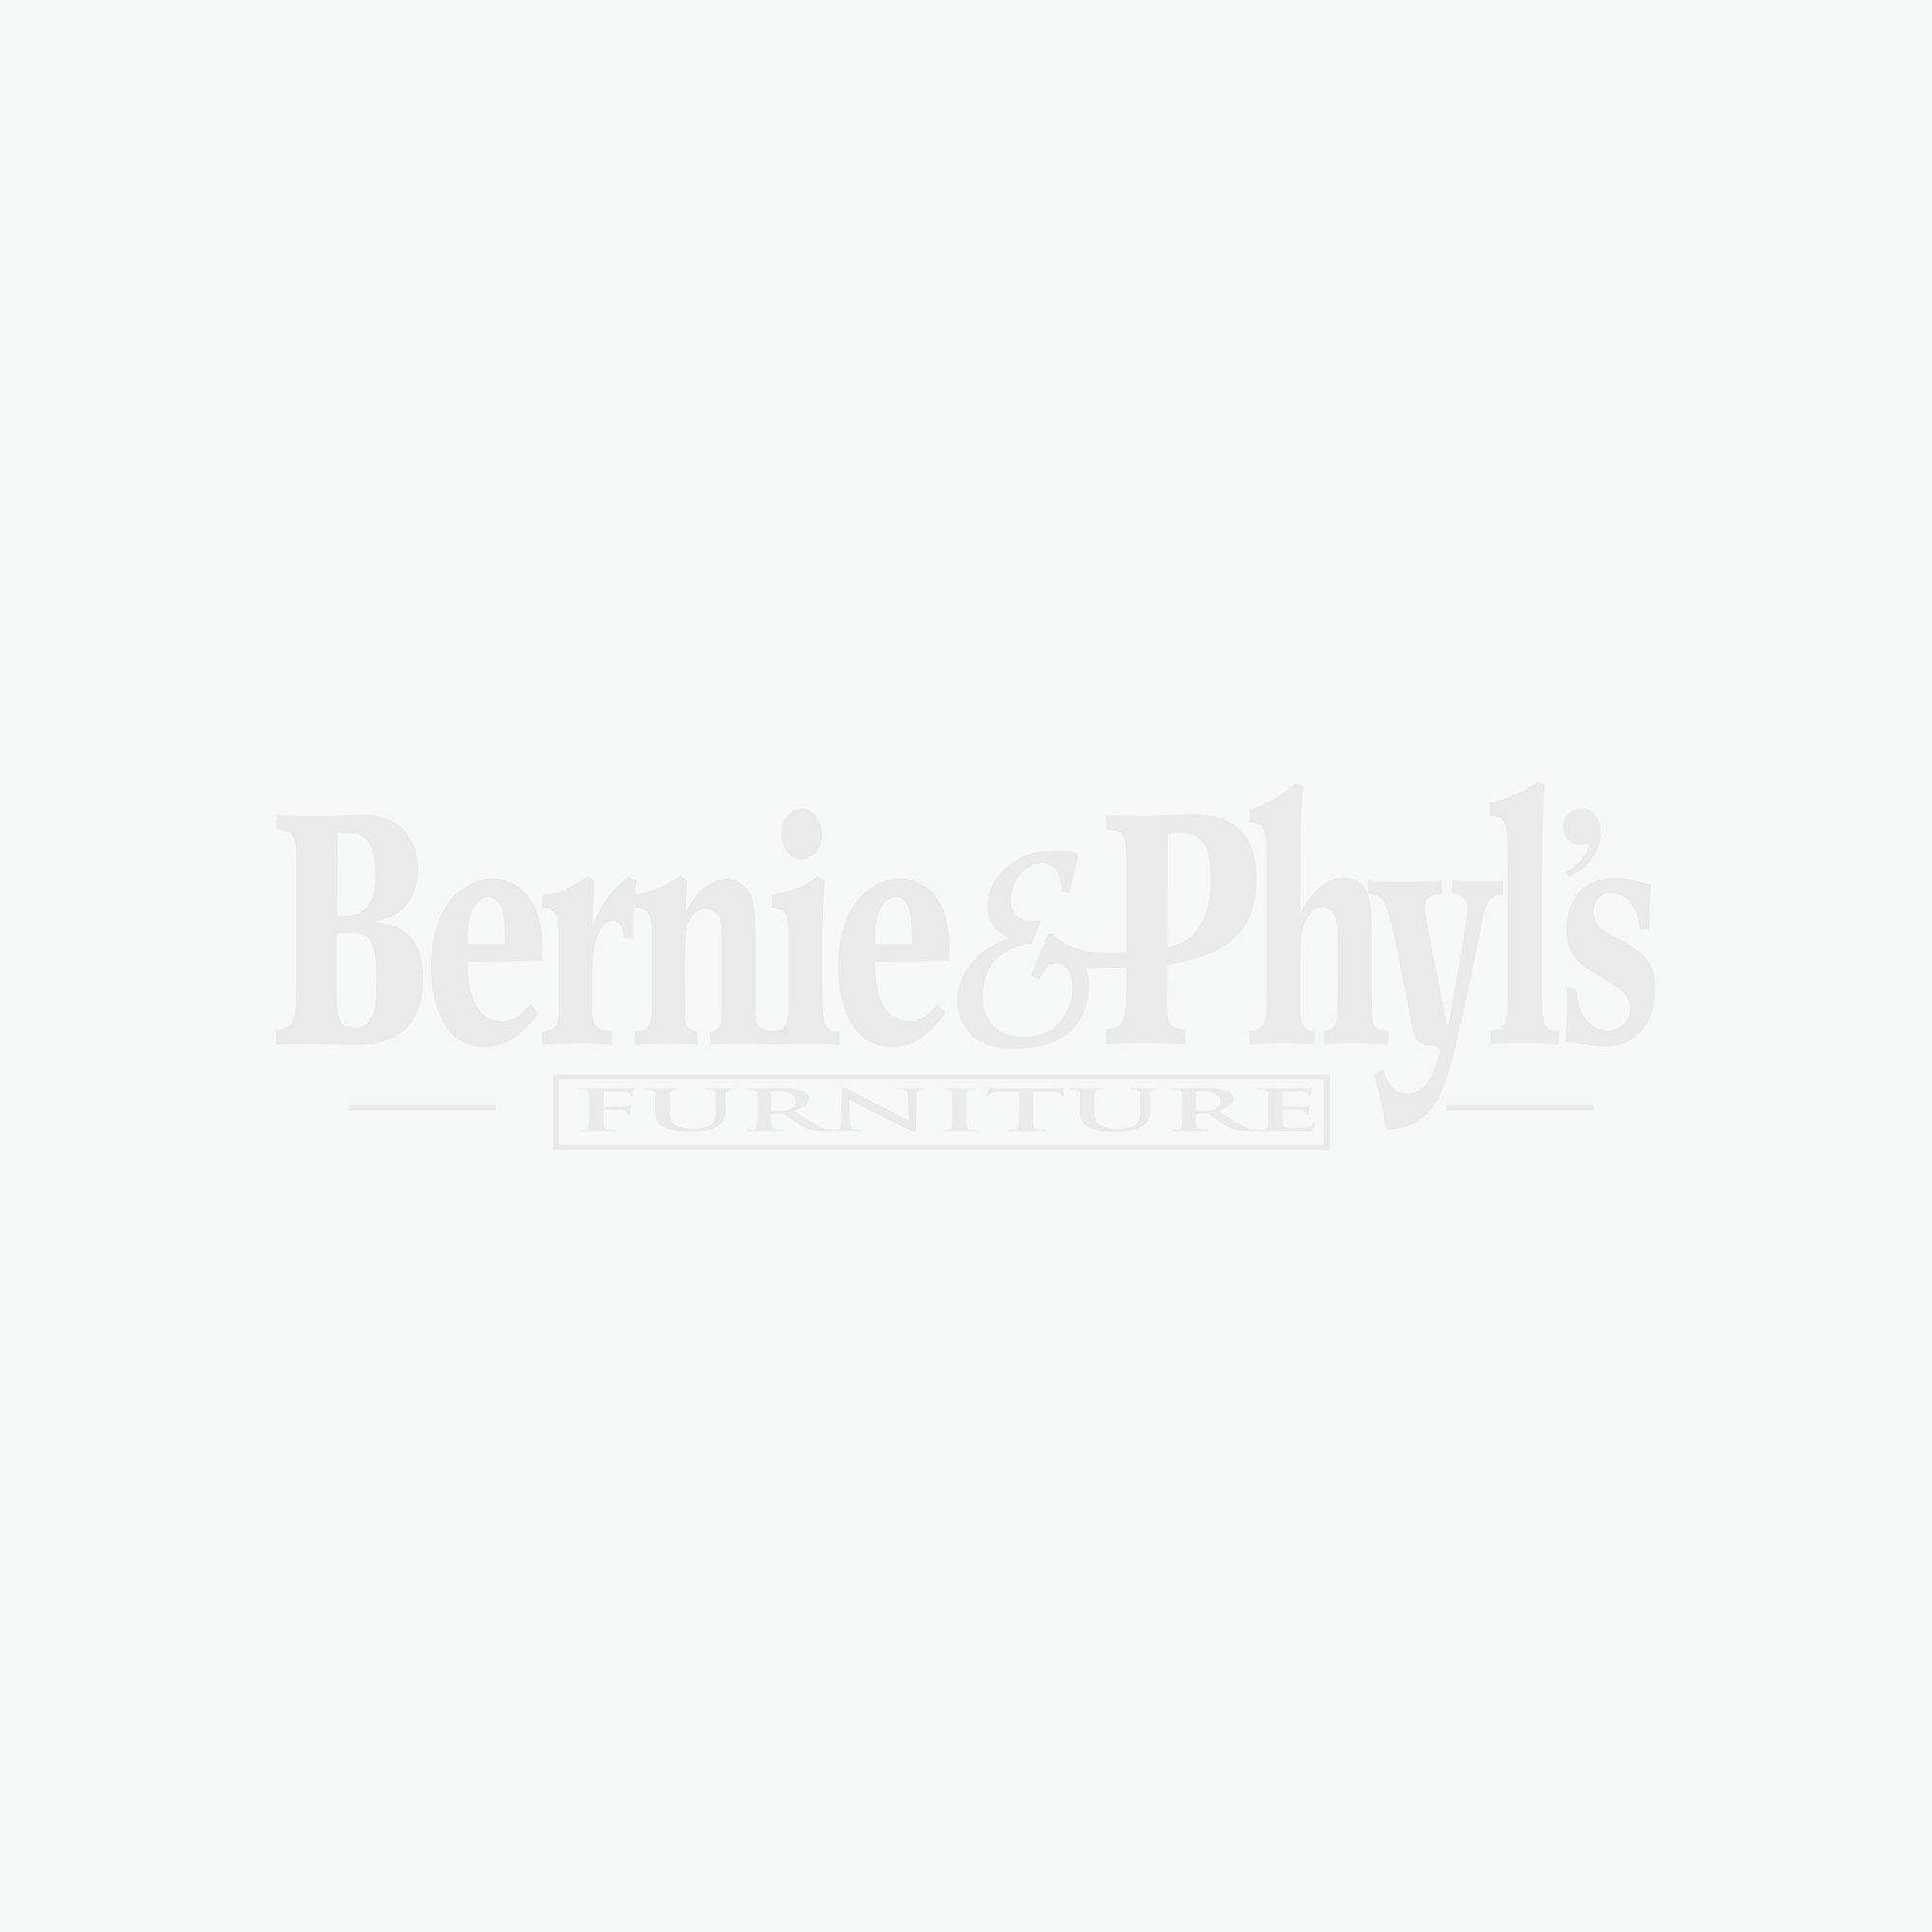 TempurPedic Supreme Breeze Flex Hybrid Mattress  Bernie